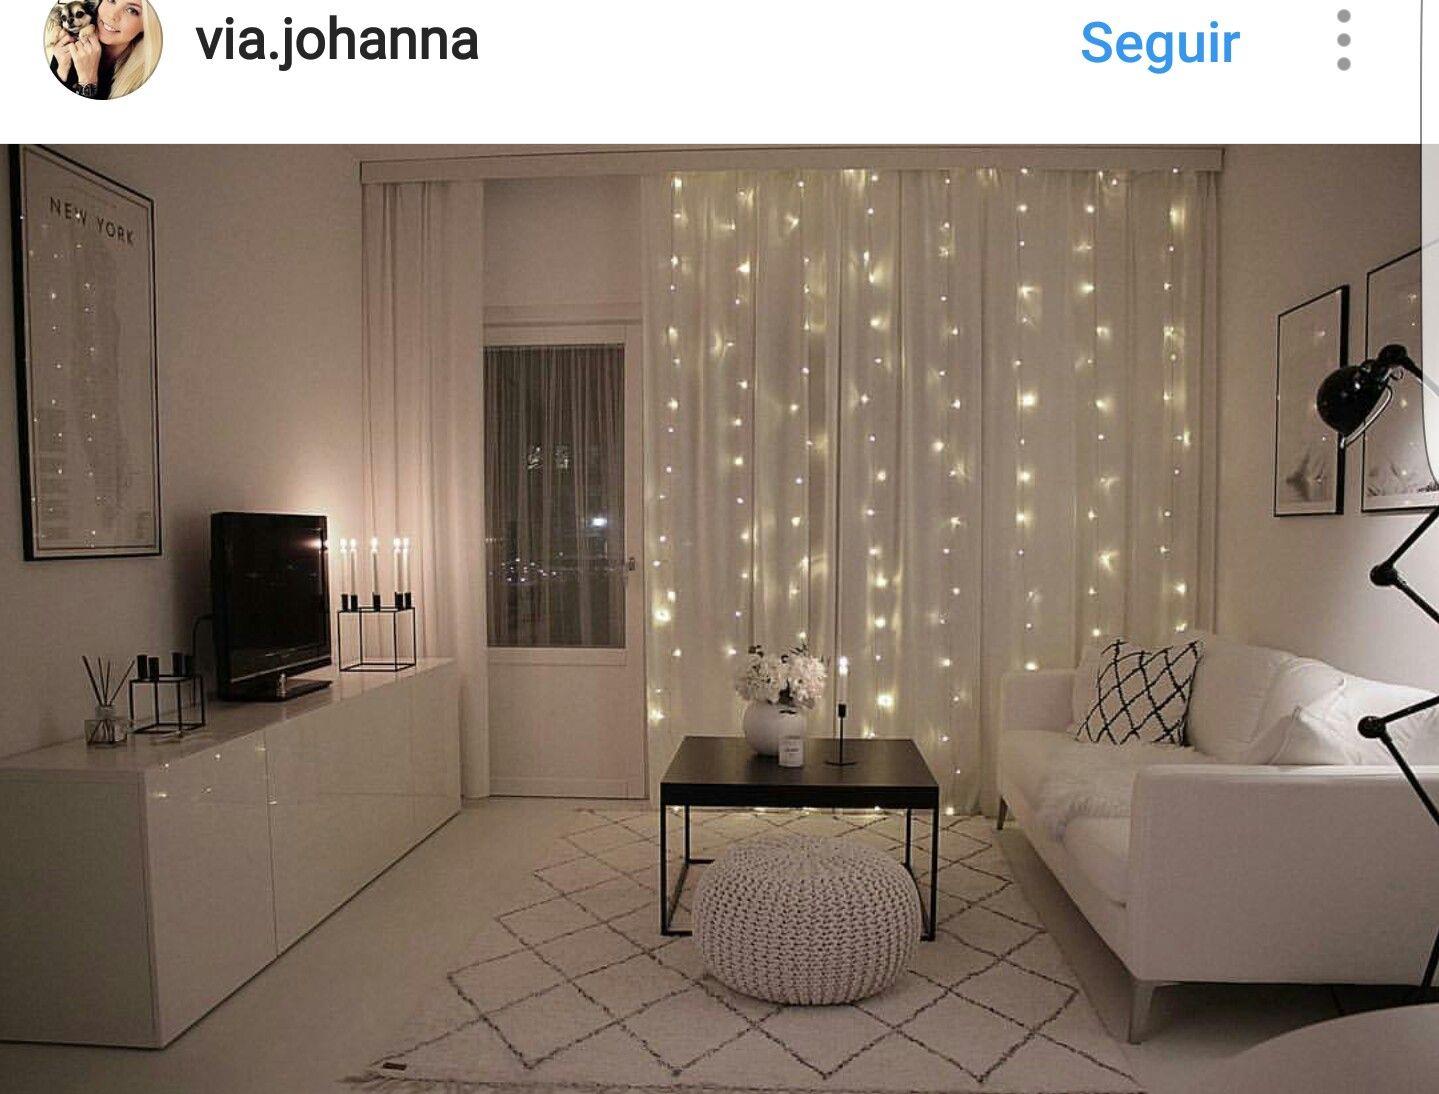 White home decoration ideas pinterest decoraci n for Mobilia instagram